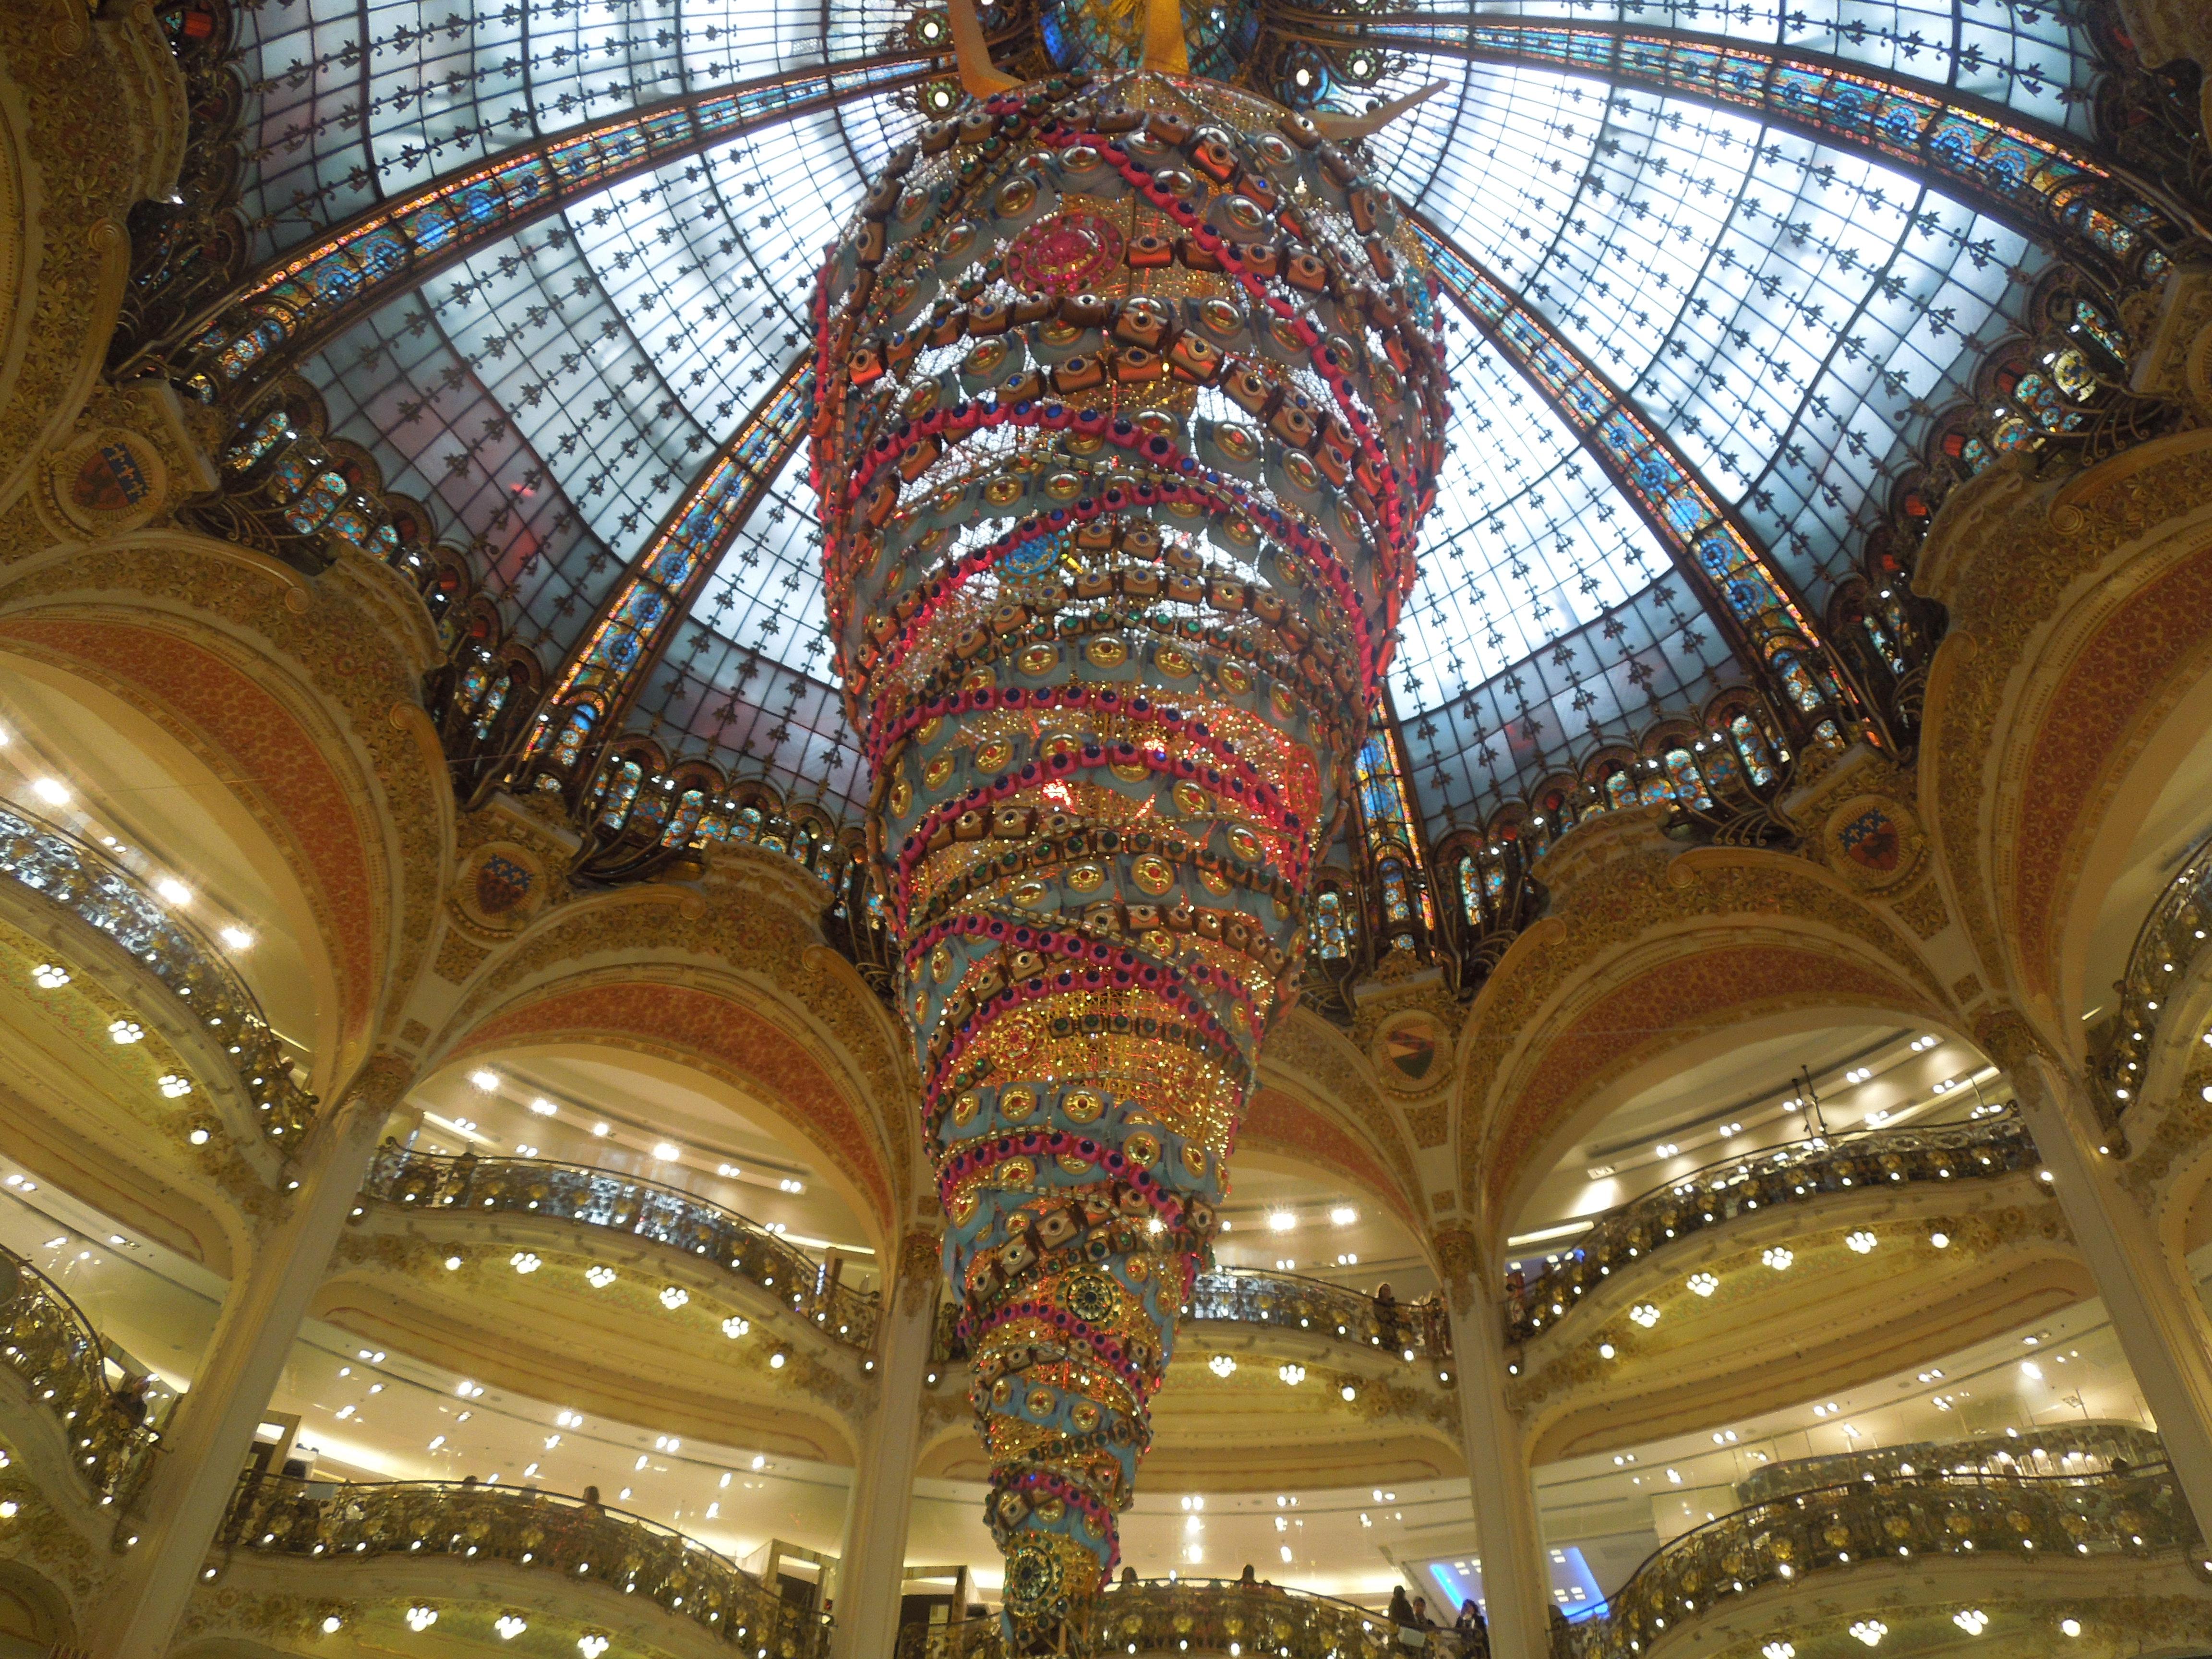 File:Christmas Decoration in Galeries Lafayette Paris France.